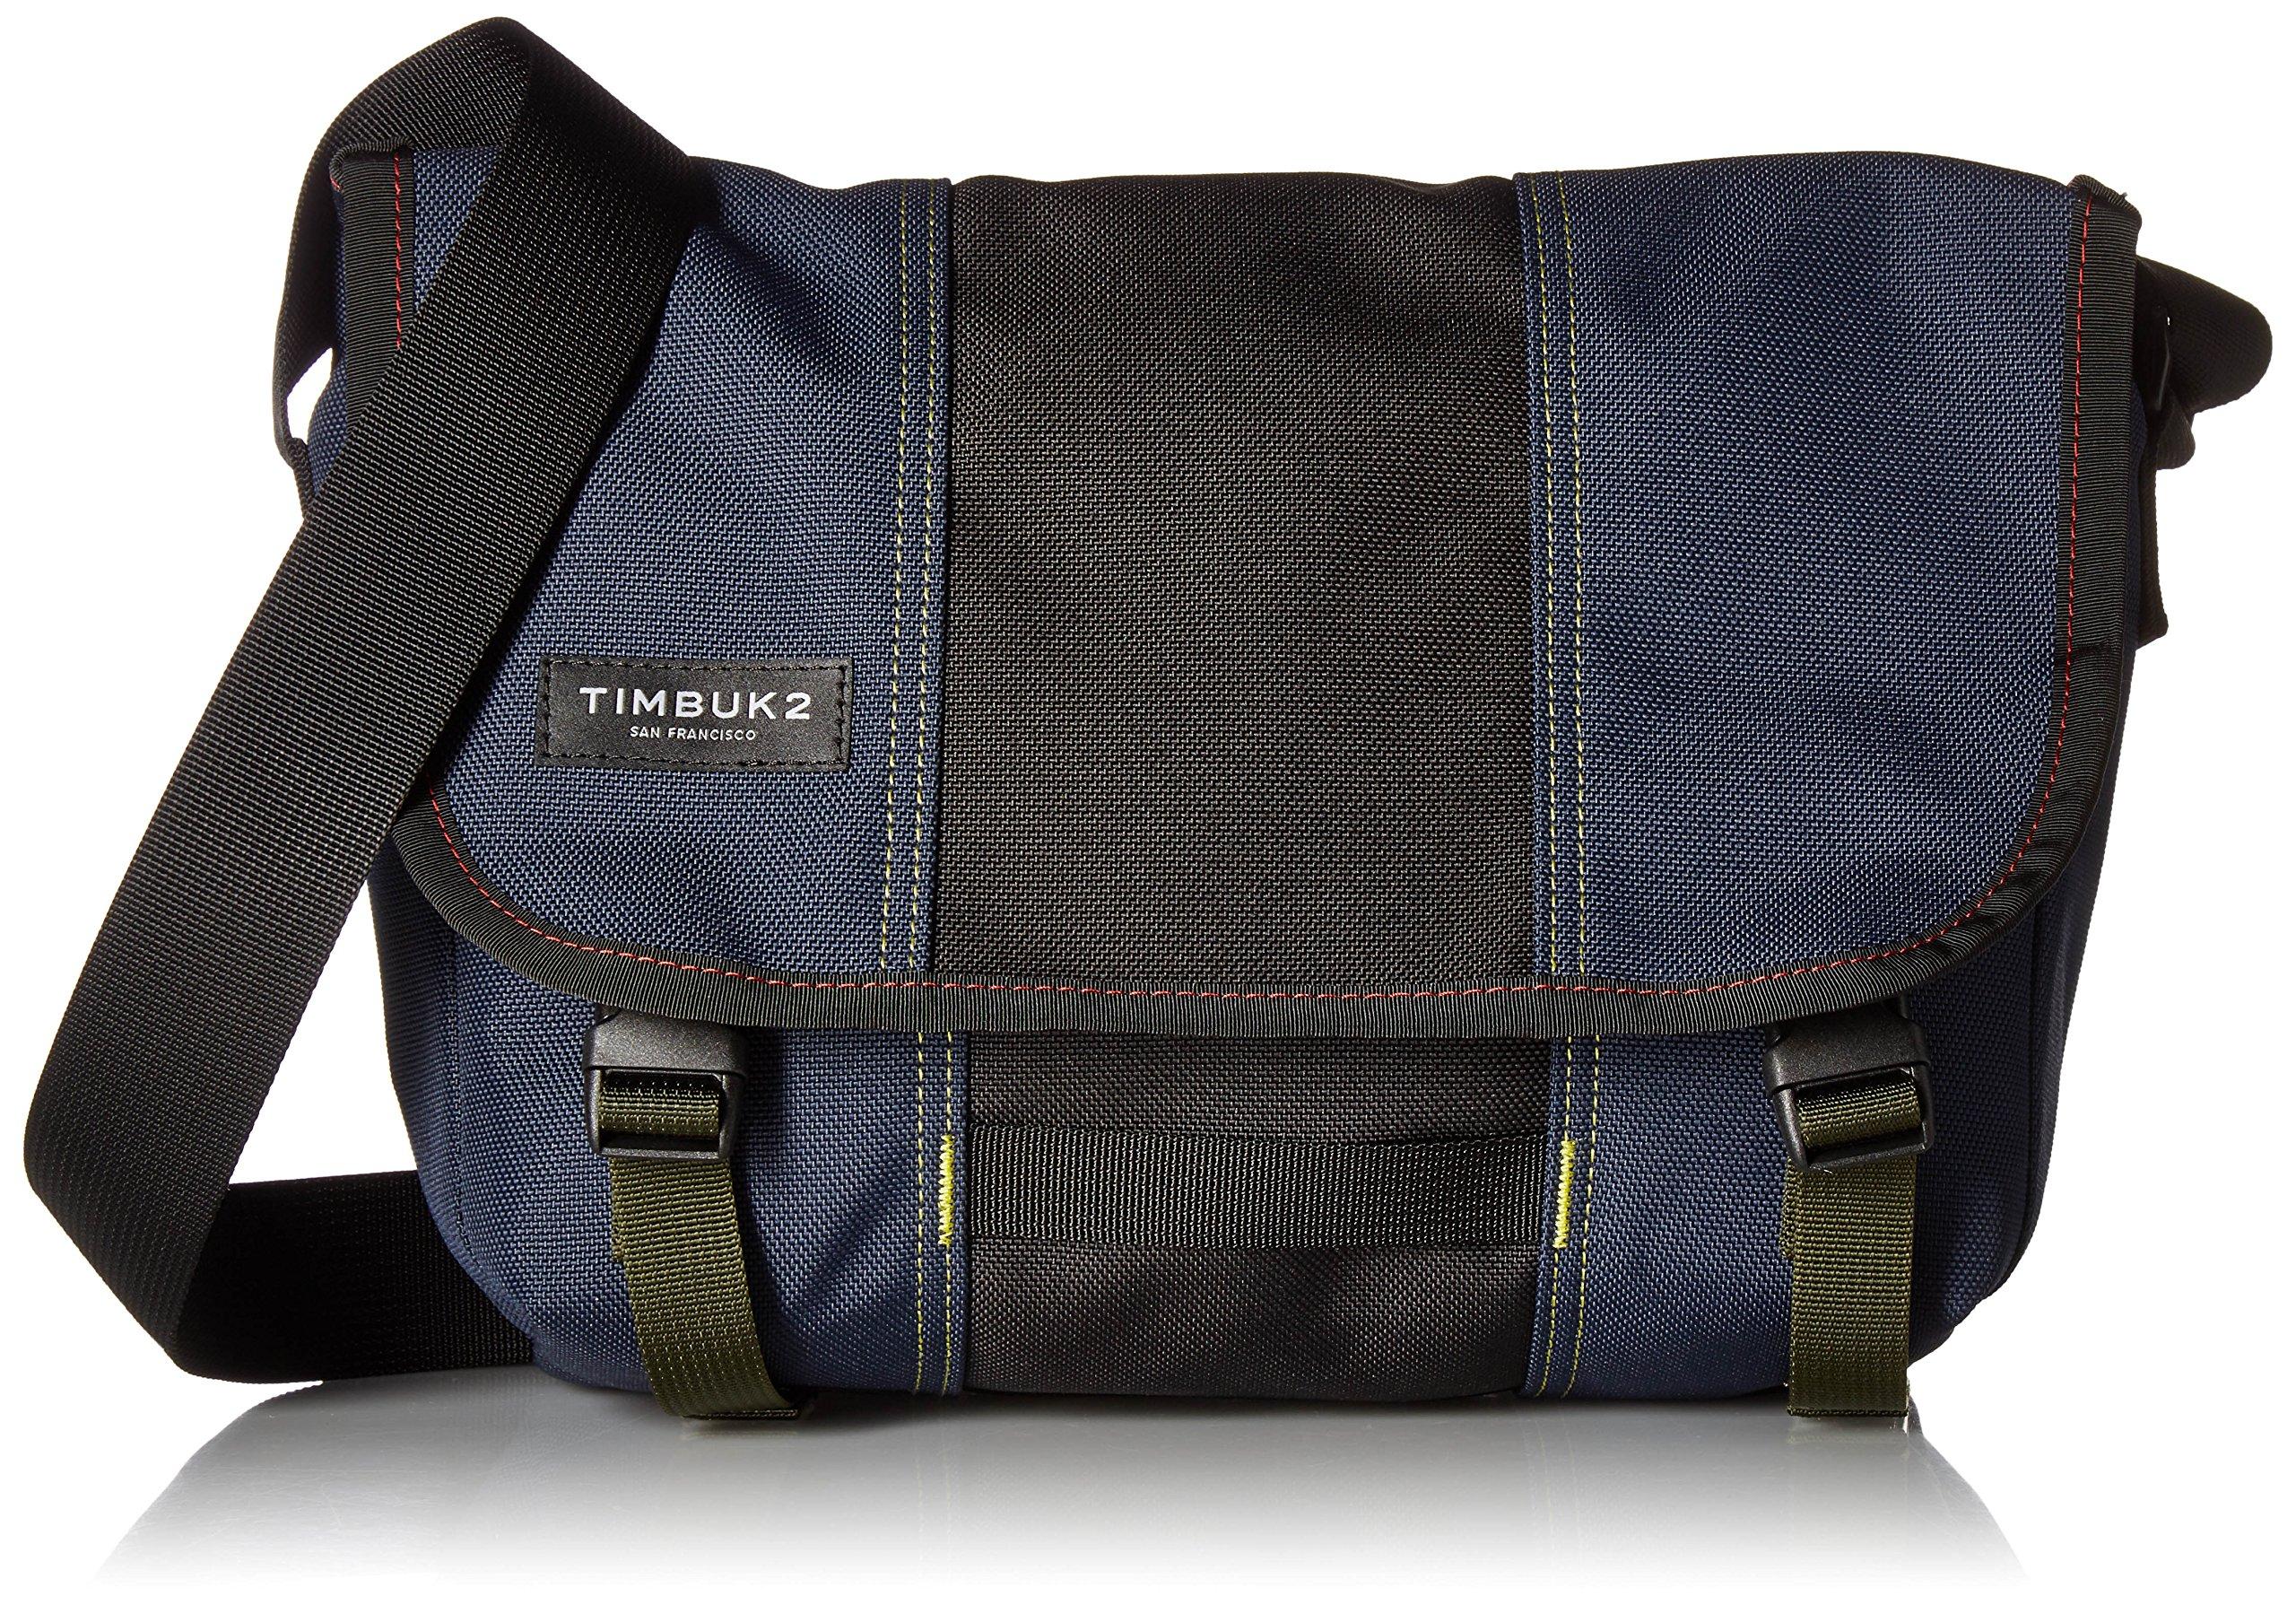 Timbuk2 Classic Messenger Bag, X-Small, Nautical/Bixi by Timbuk2